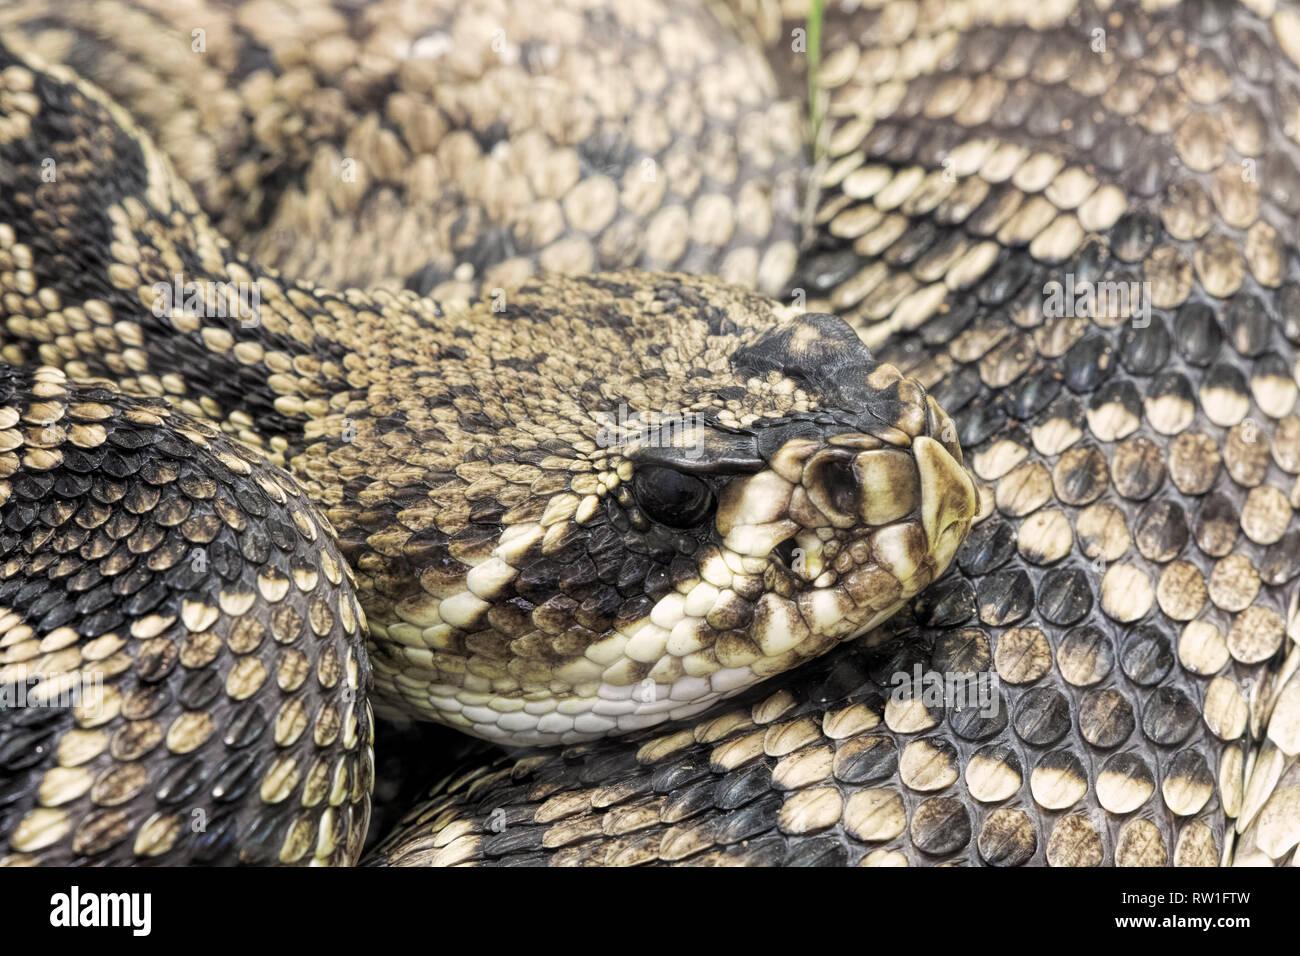 Eastern Diamondback Rattlesnake. Crotalus adamanteus is a venomous pit viper native to the Southeastern United States Stock Photo